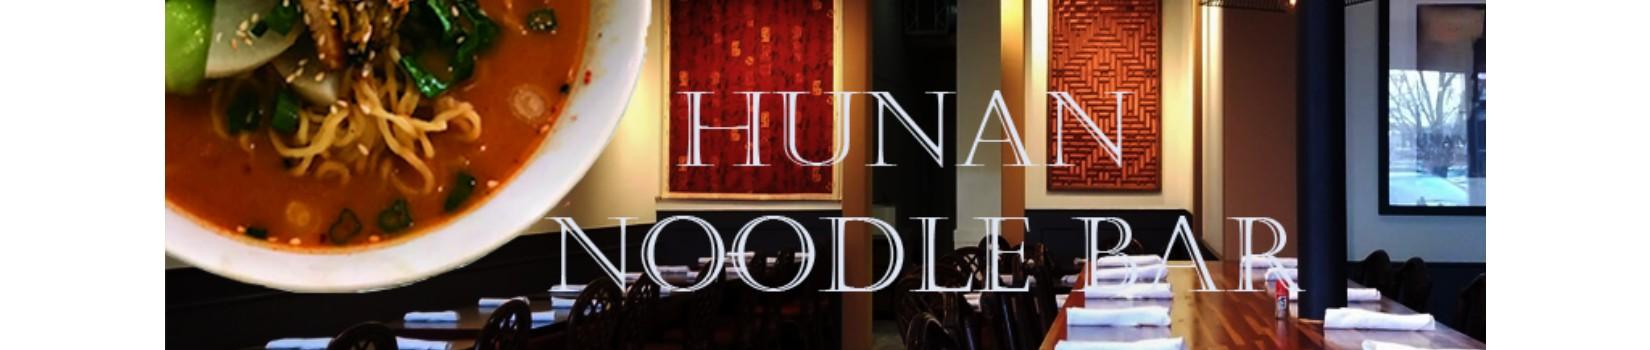 Hunan Noodle Bar